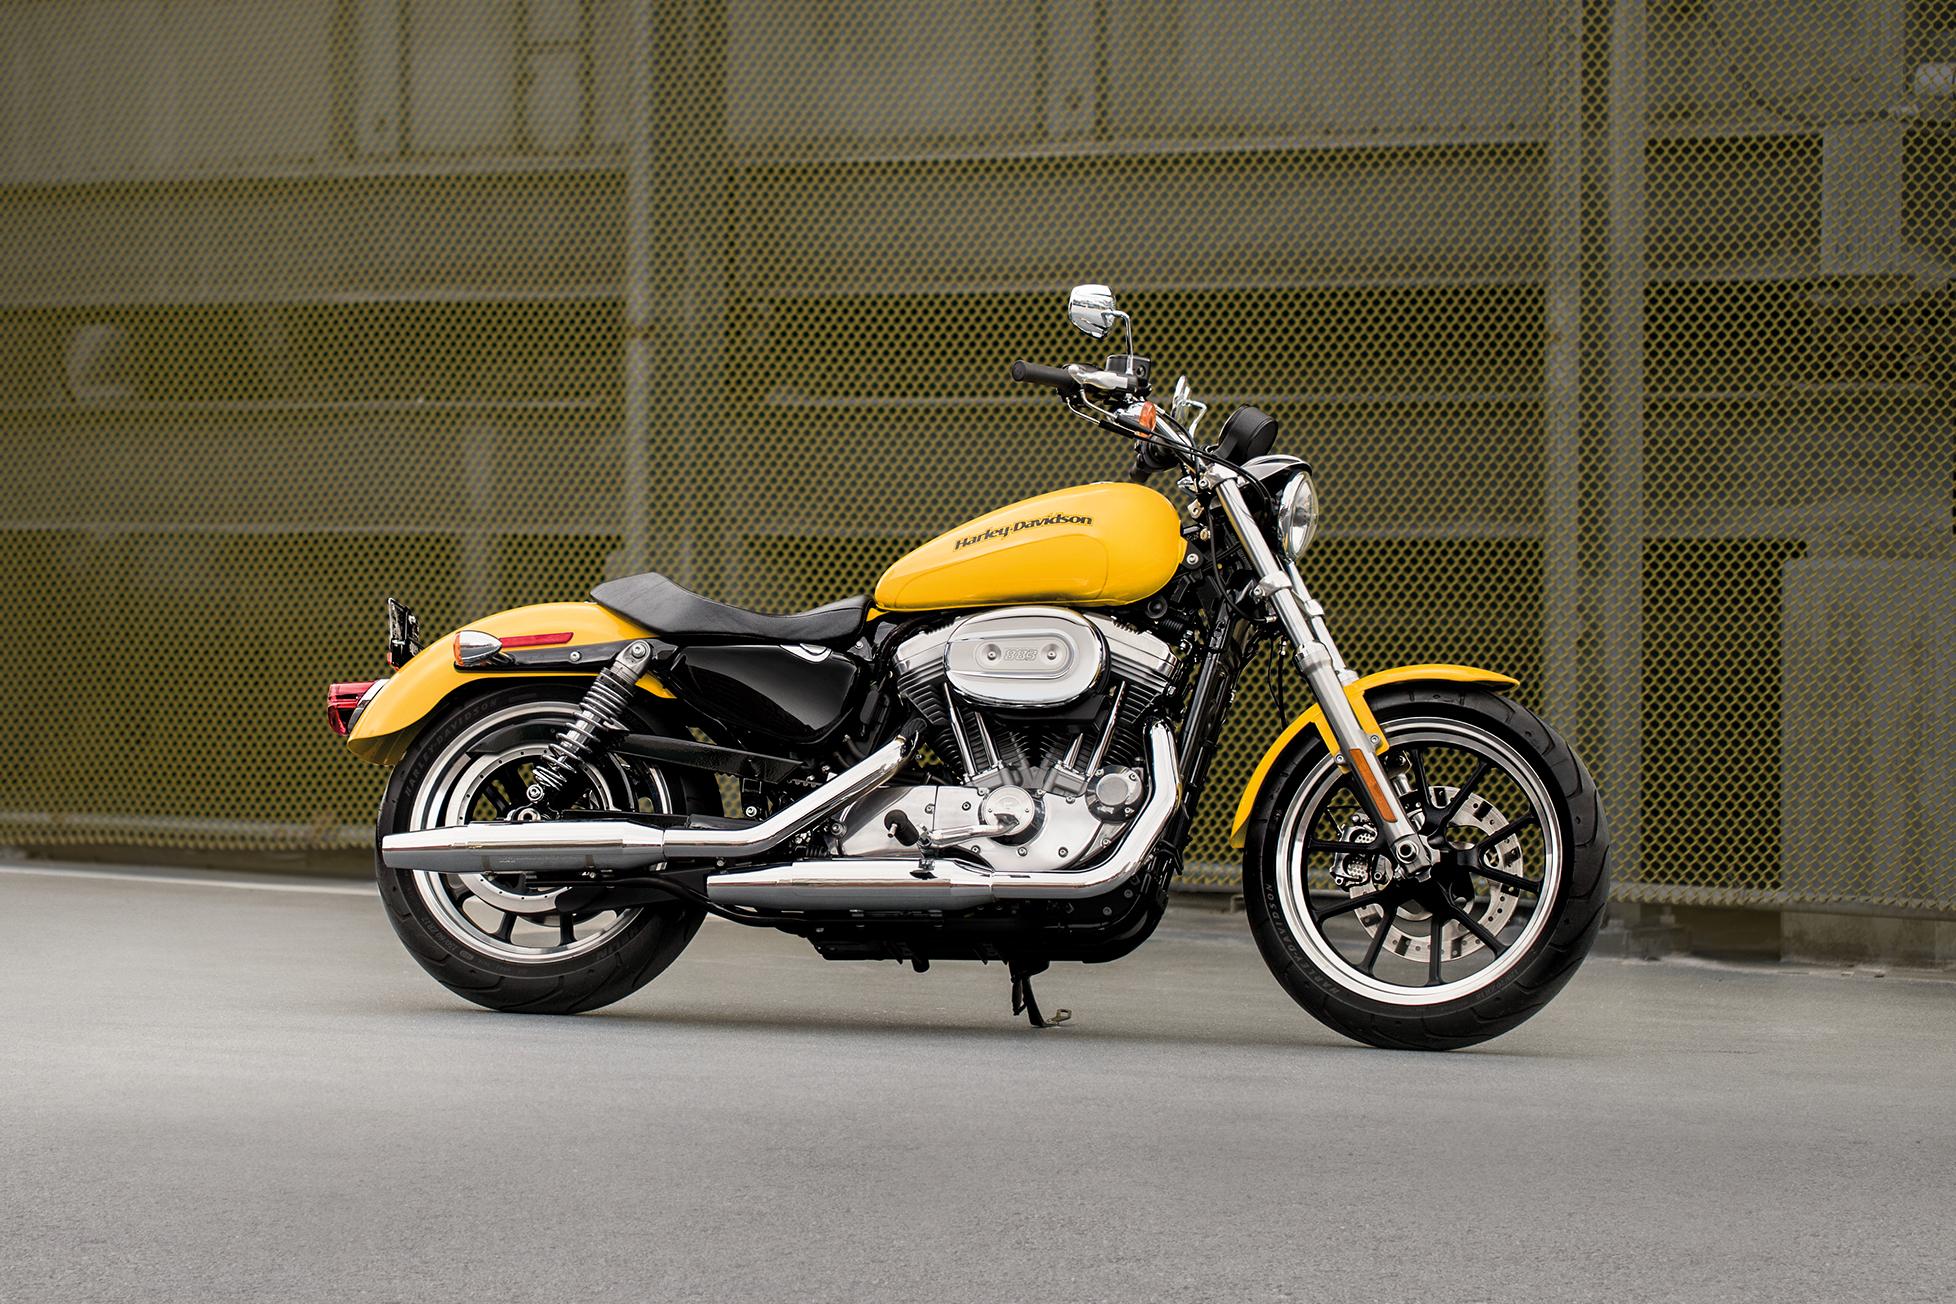 Pink Harley Davidson Sportster 883 Models Motorcycle Superlow 1137x758